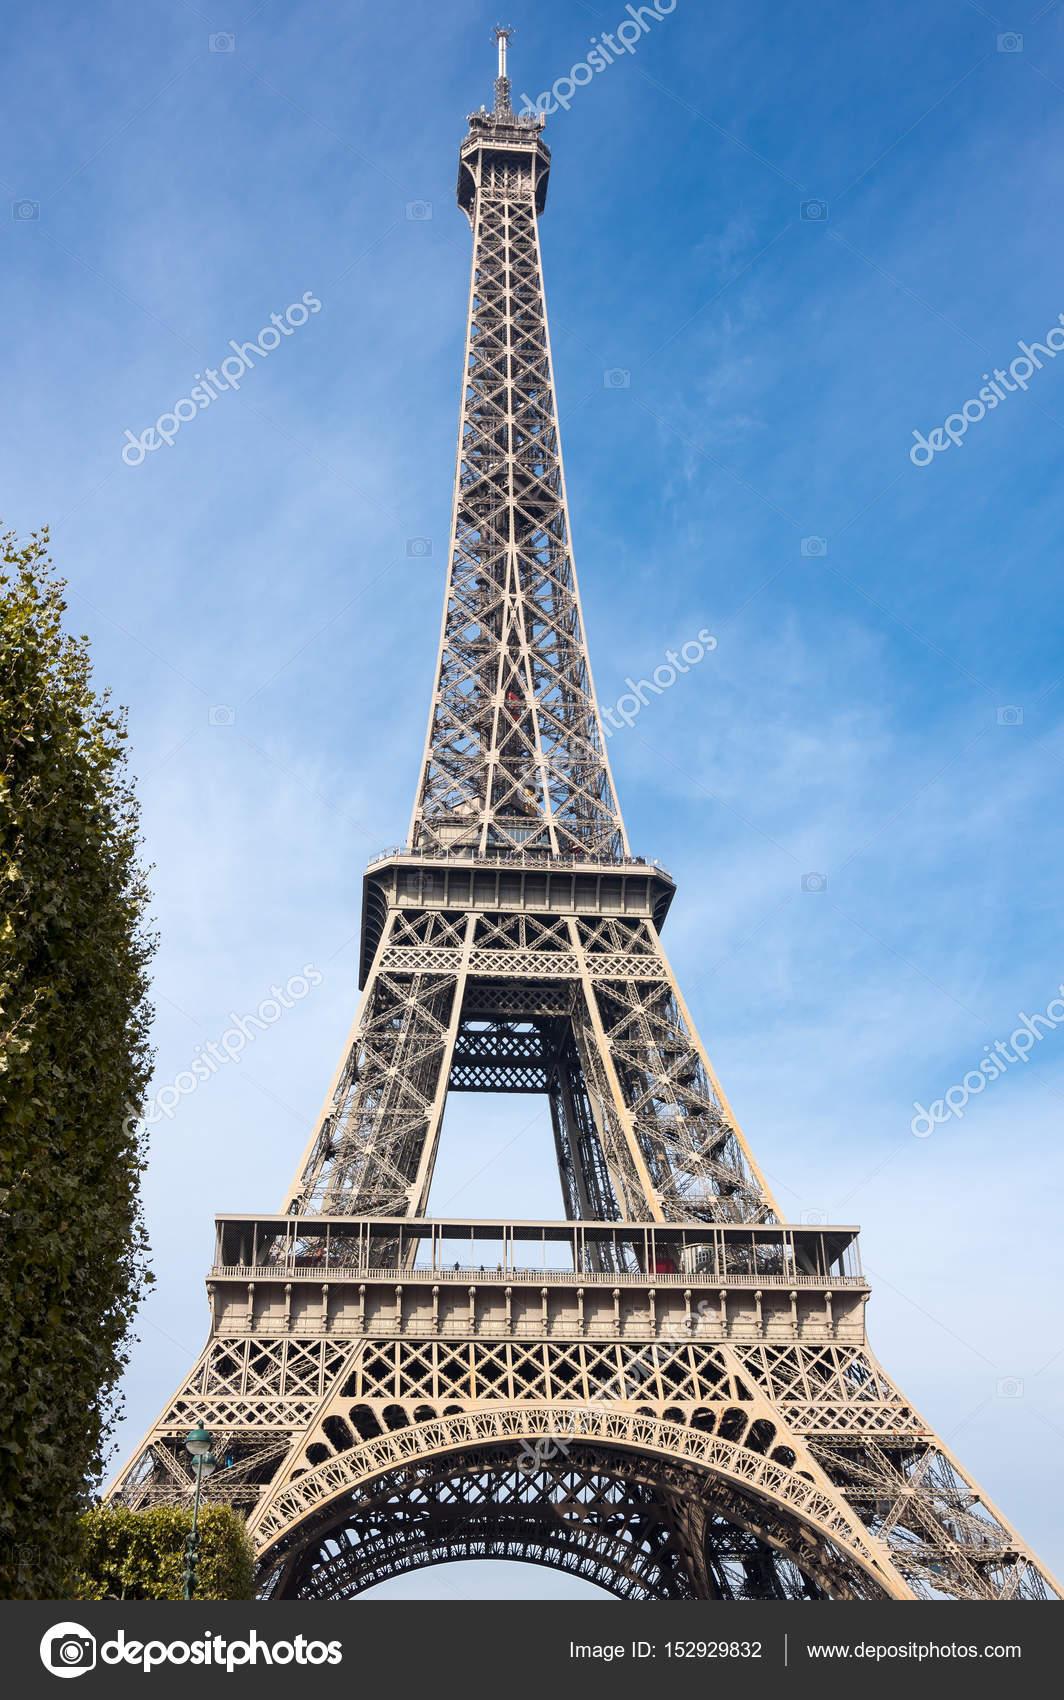 der eiffelturm in paris stockfoto gumbao 152929832. Black Bedroom Furniture Sets. Home Design Ideas